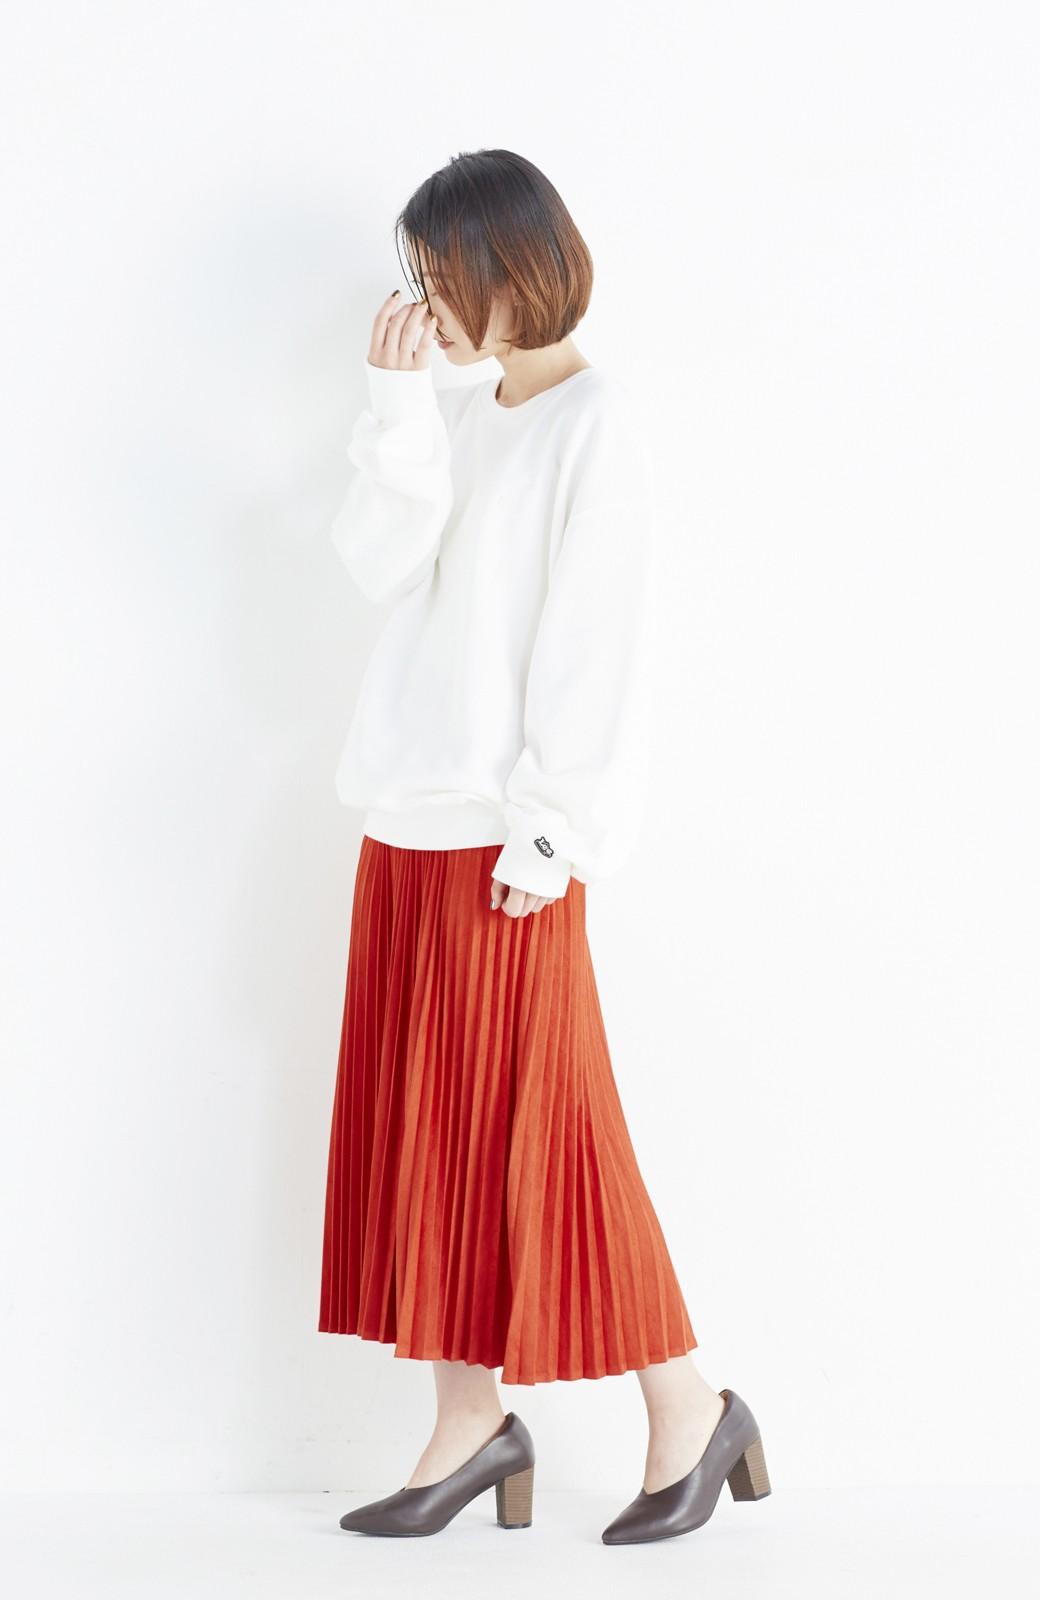 haco! 楽して女っぽい フェイクスエードのプリーツスカート  by que made me <オレンジ系その他>の商品写真7